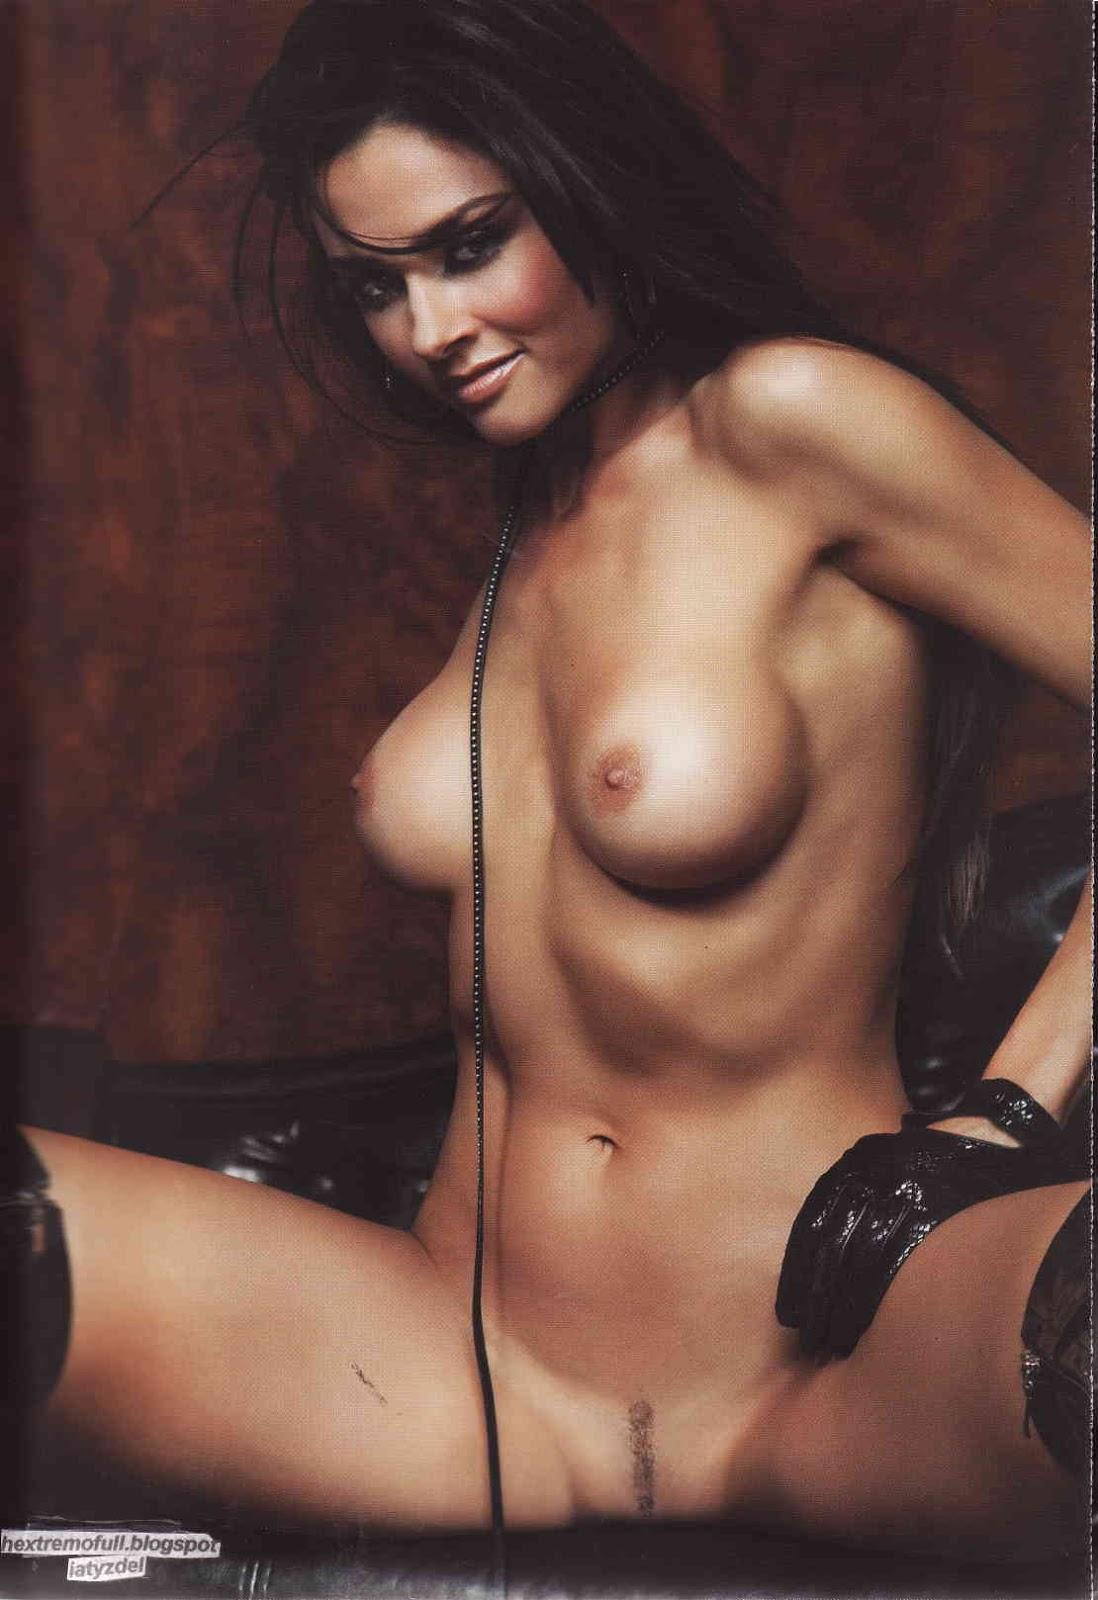 Extremo desnuda h dorismar